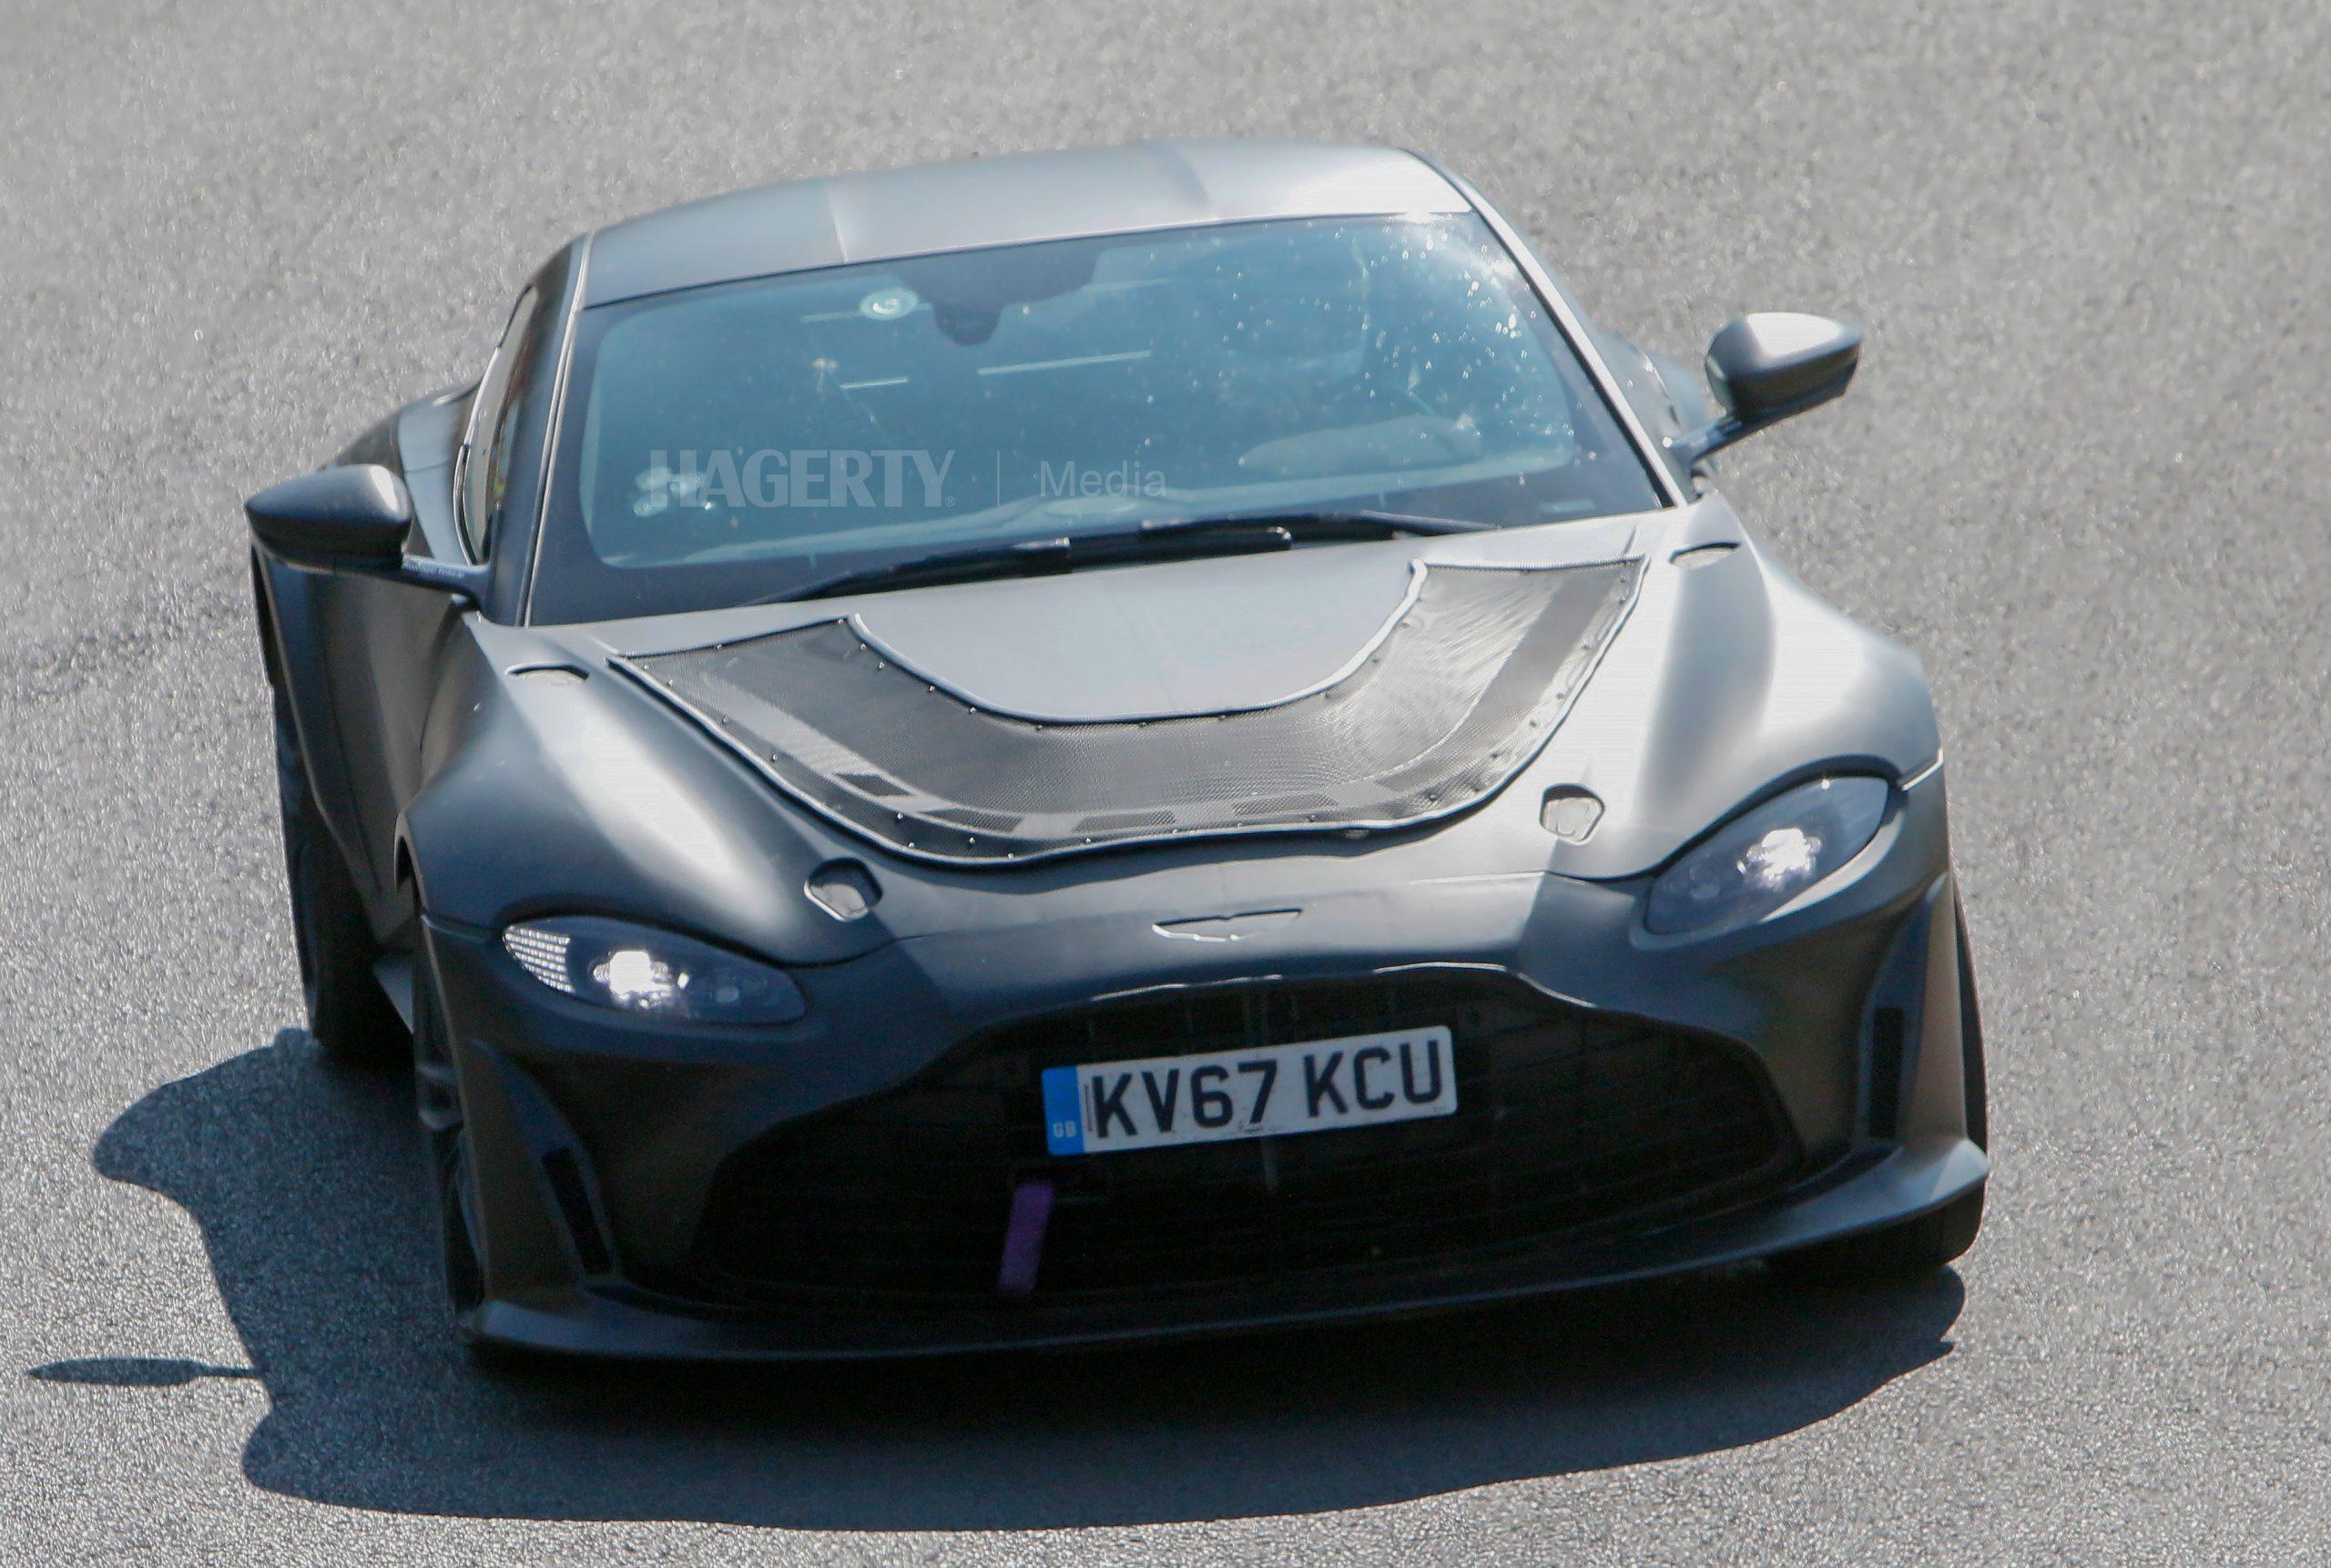 Aston Martin Vantage mule spy shot front